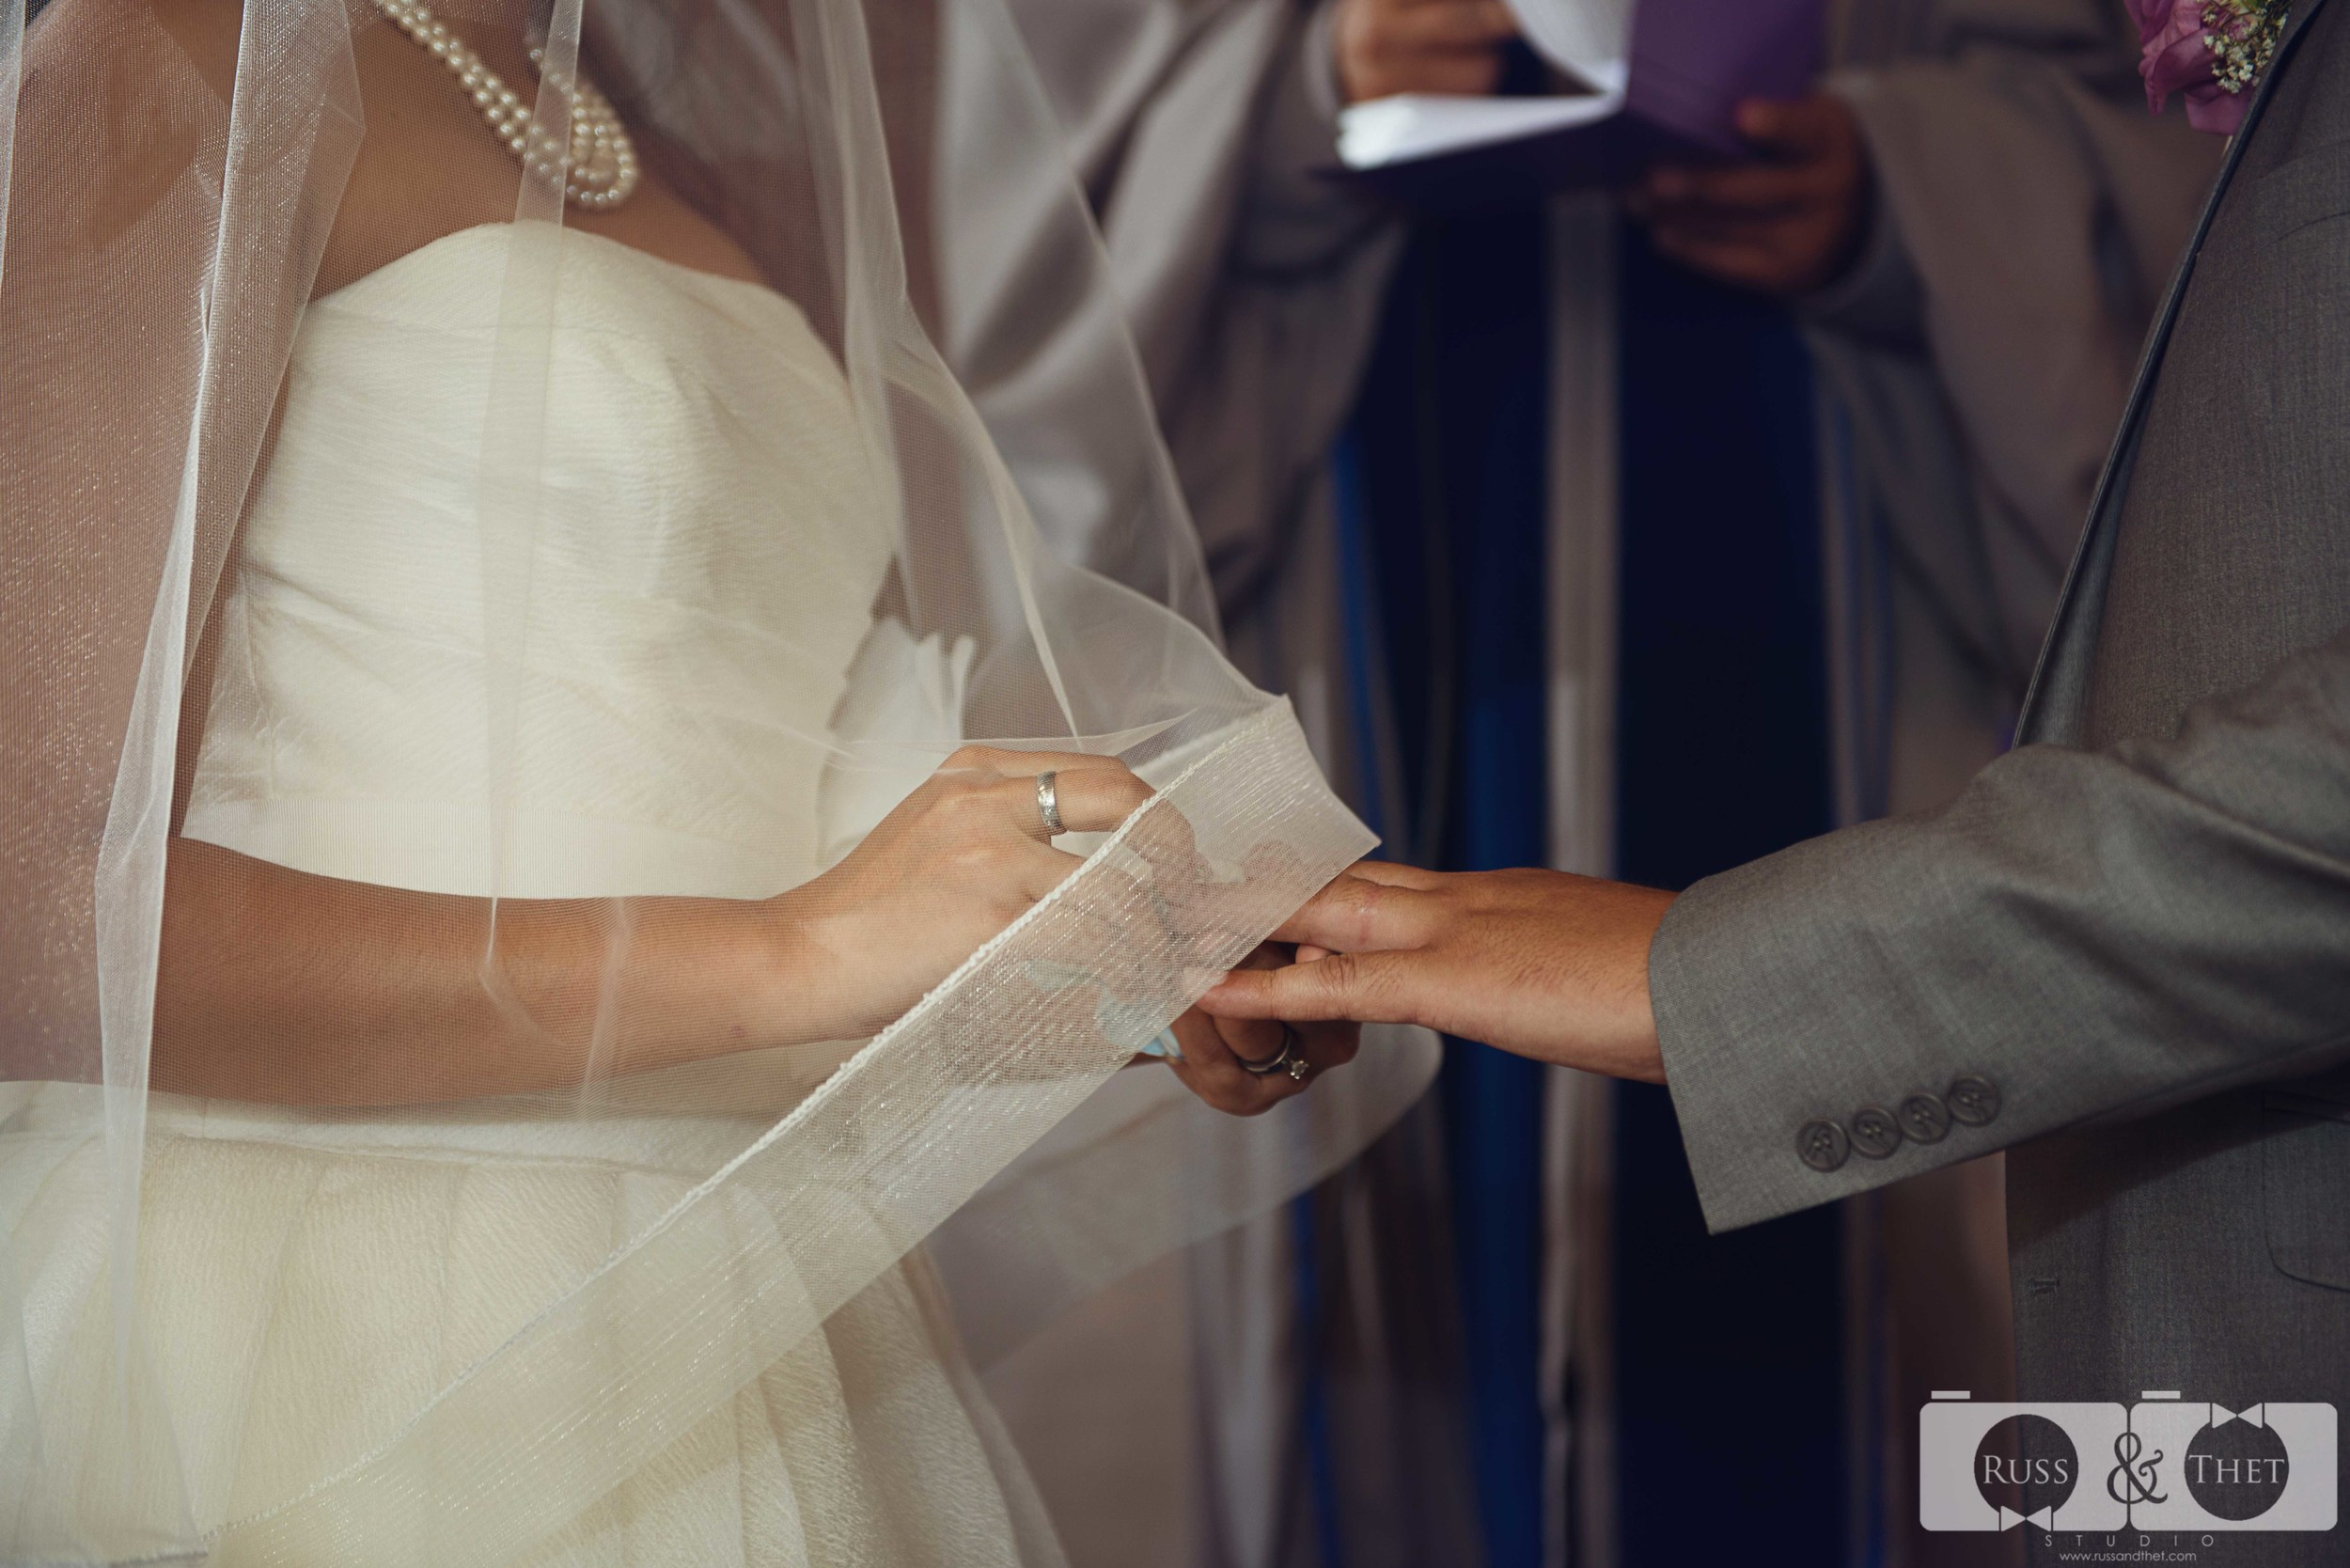 royal-palace-banquet-hall-glendale-wedding-37.JPG